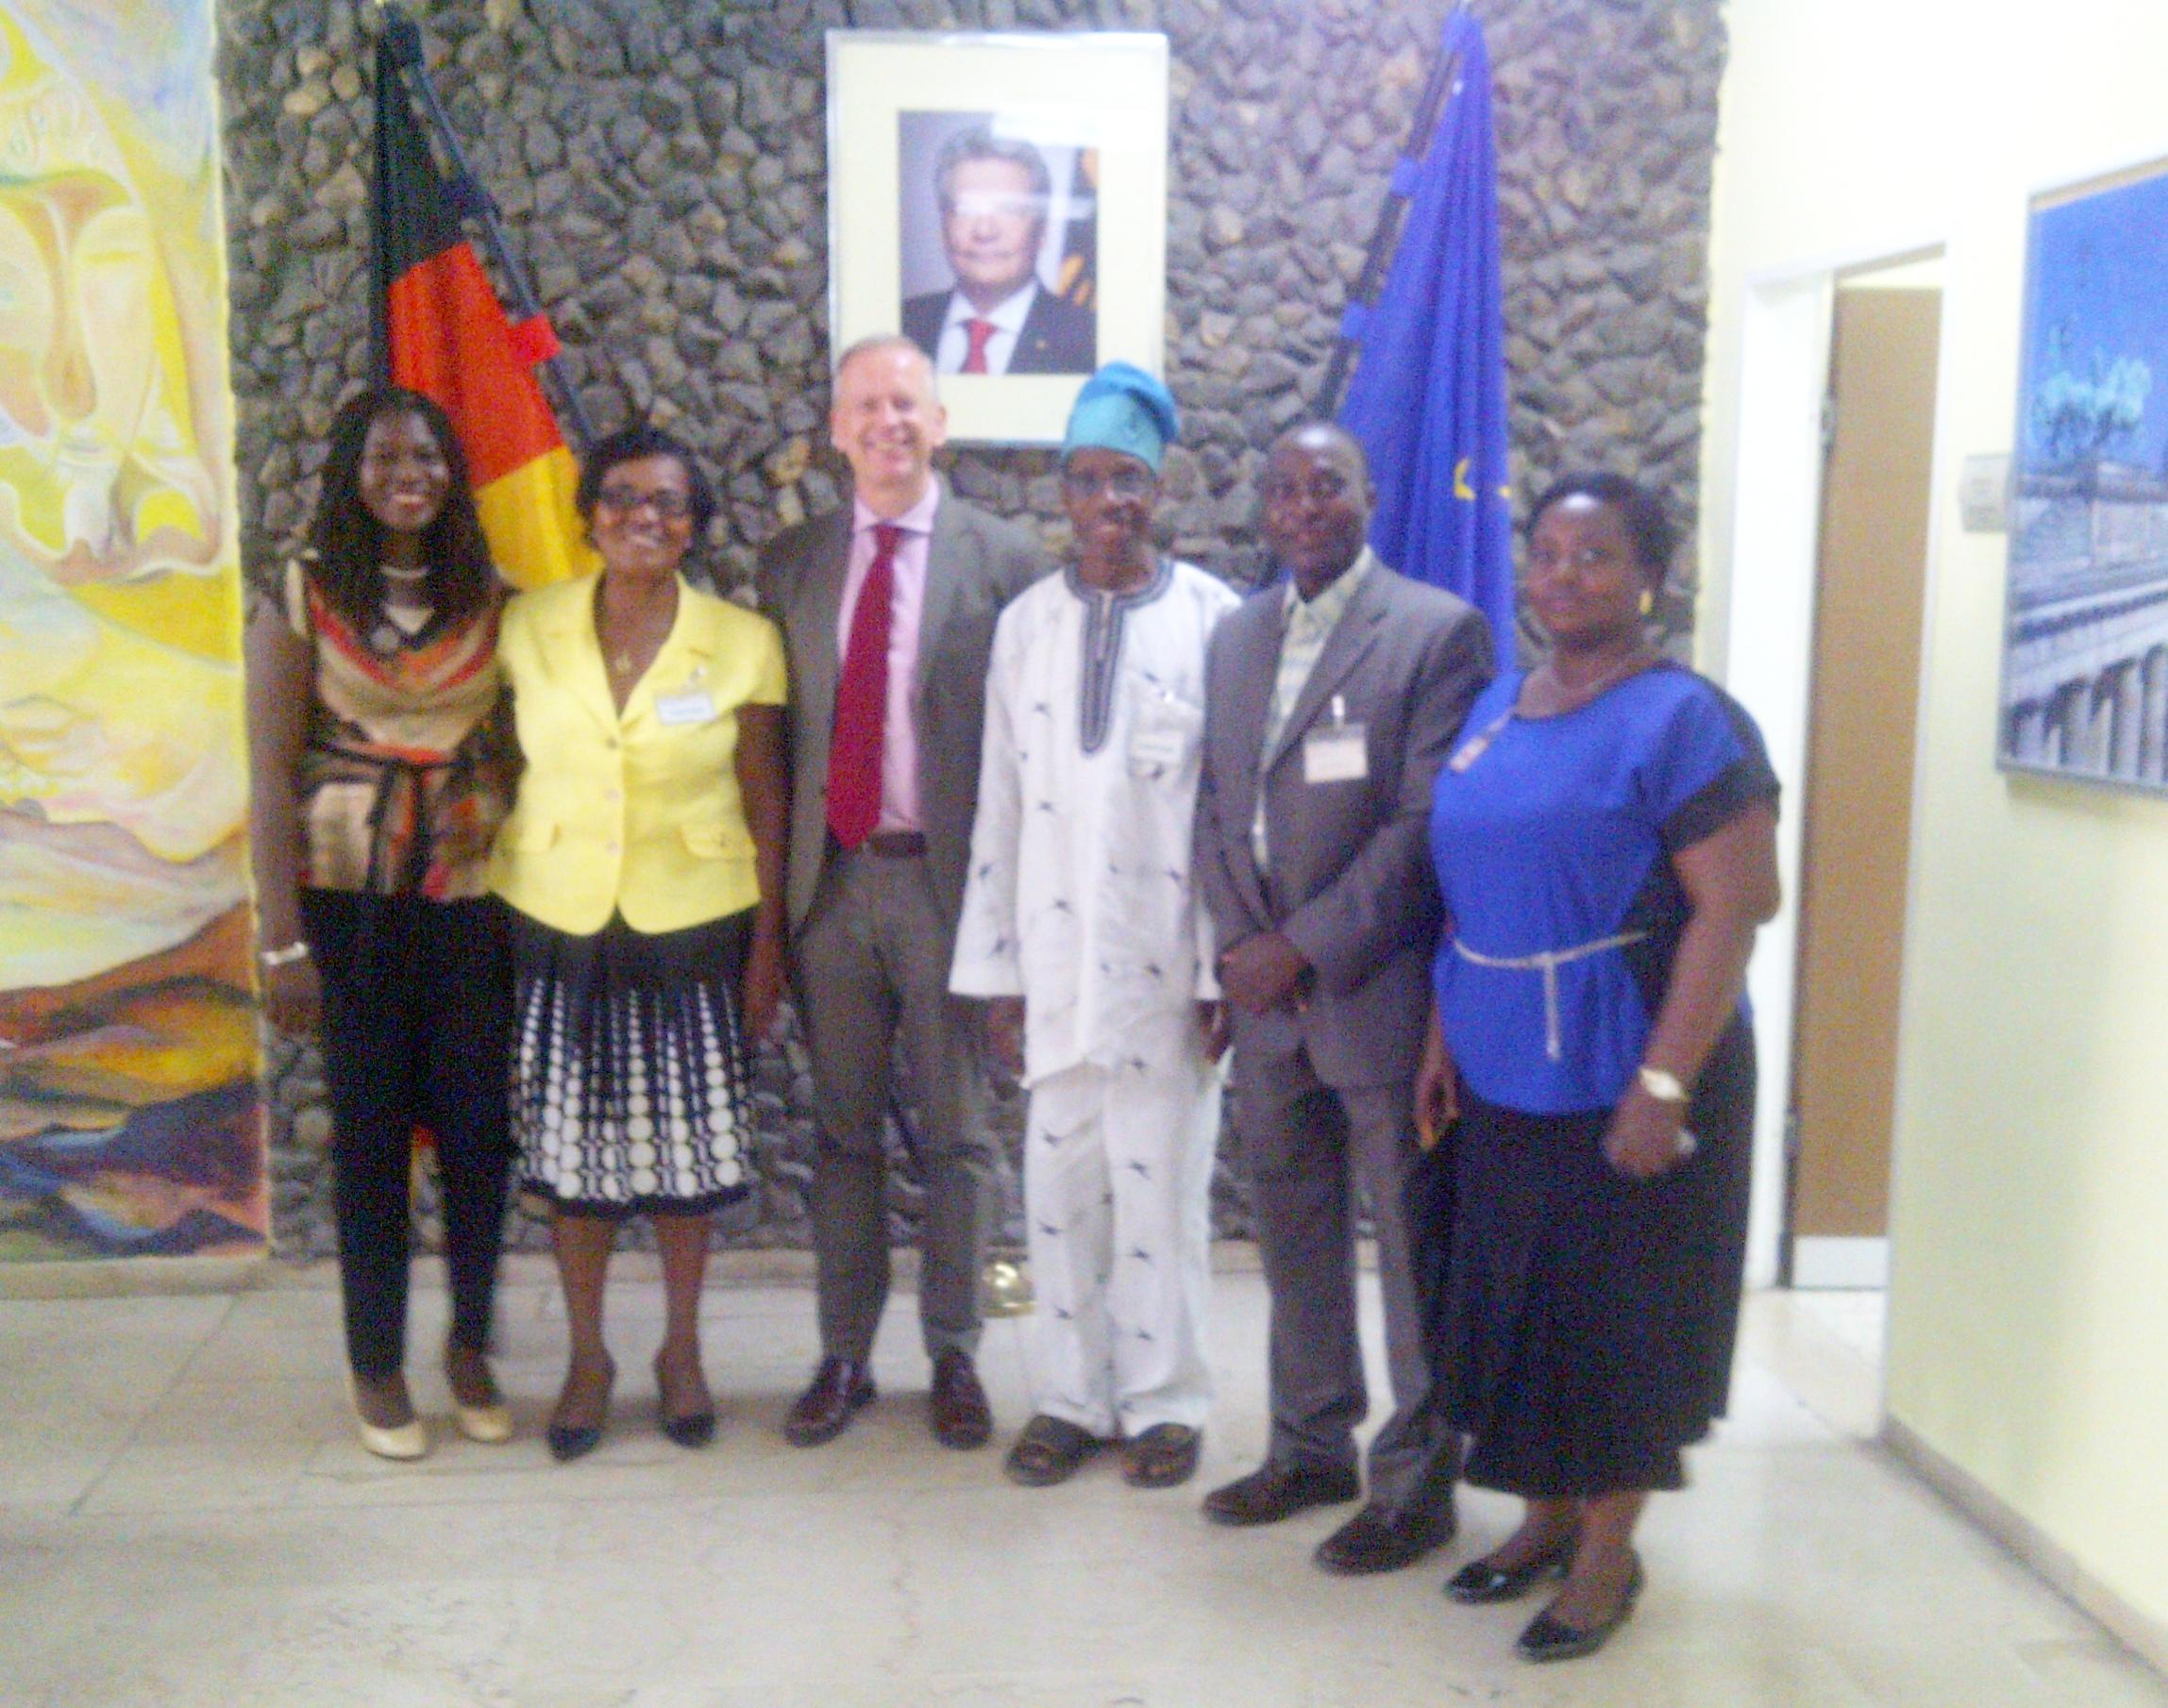 UNAN visit to the German Embassy 19th April 2016